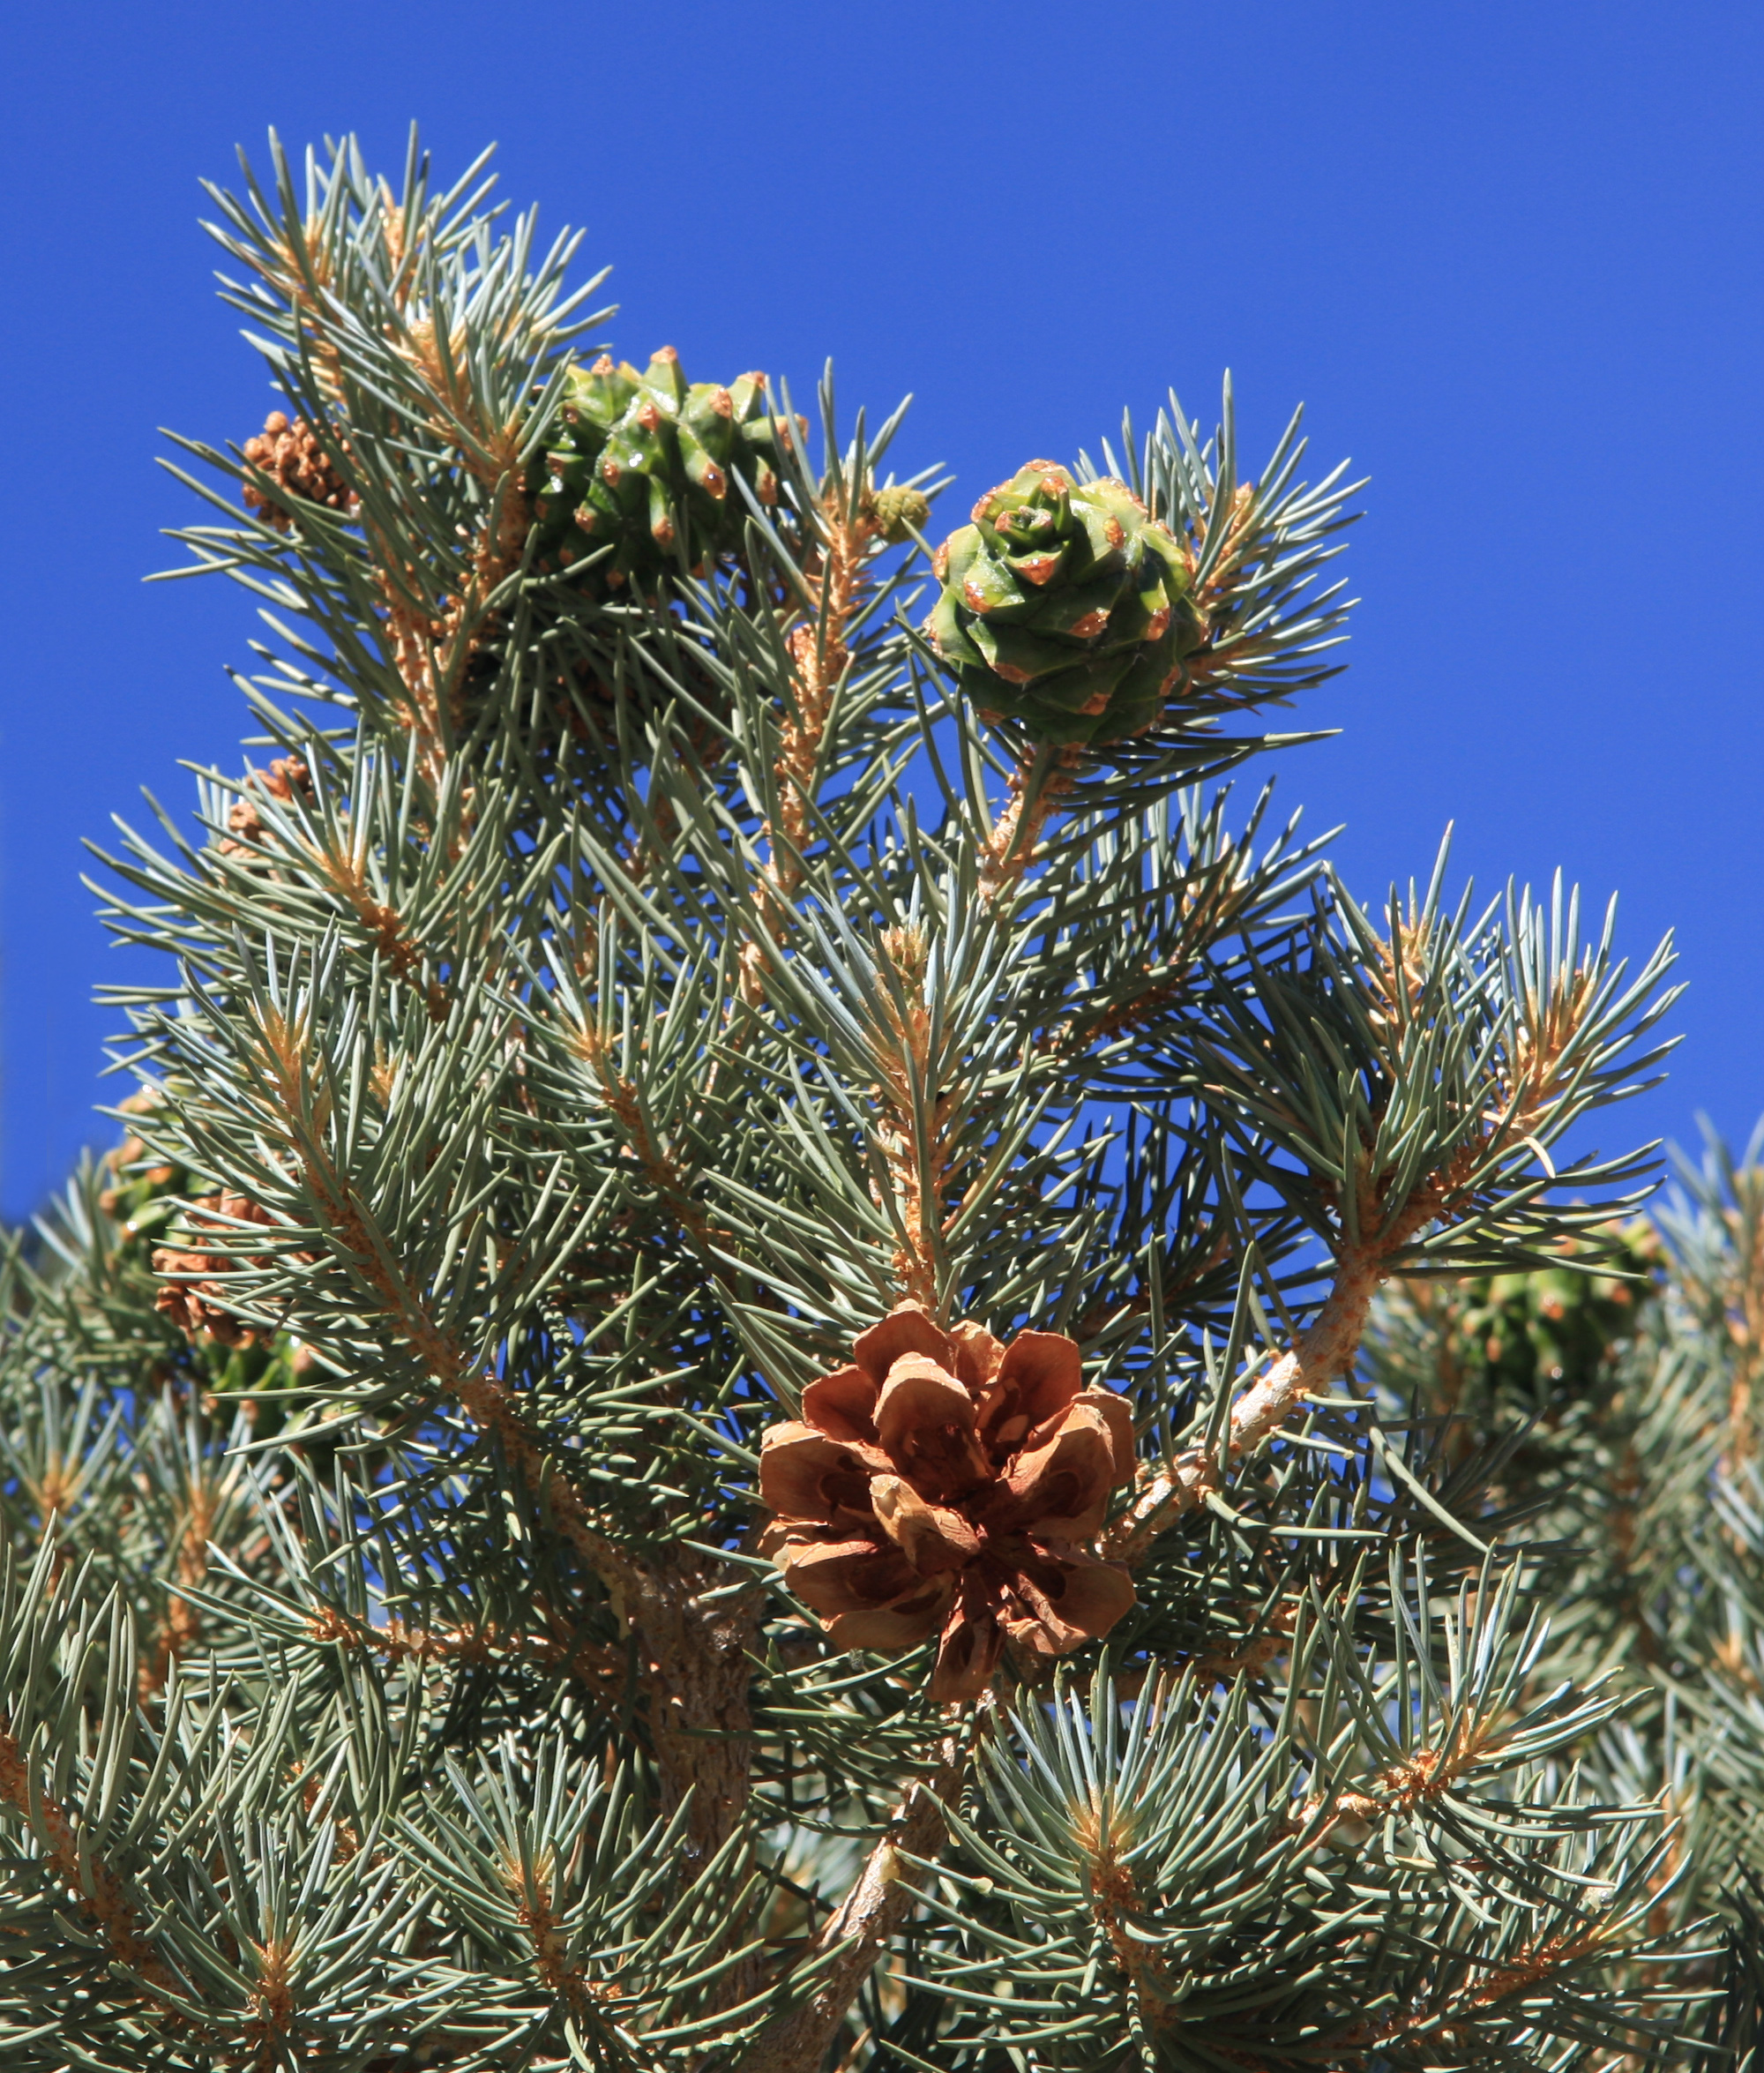 piñon pine cone